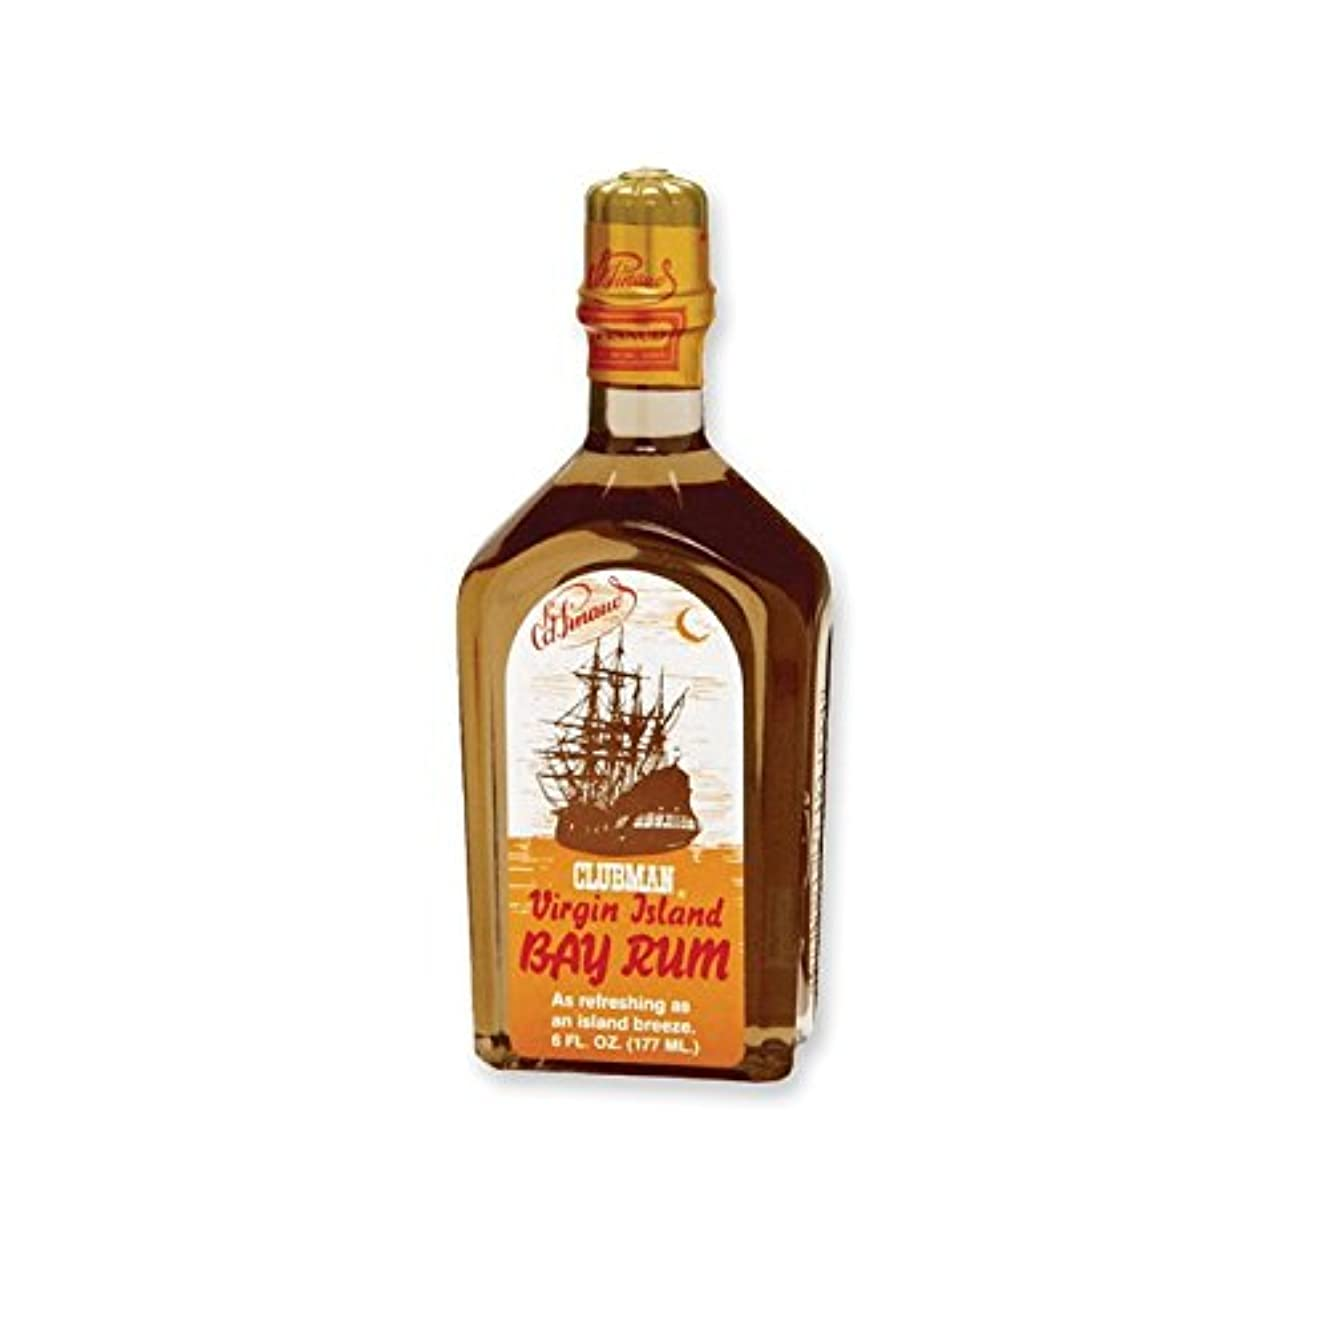 低下仕立て屋候補者CLUBMAN Virgin Island Bay Rum, 6 oz (並行輸入品)